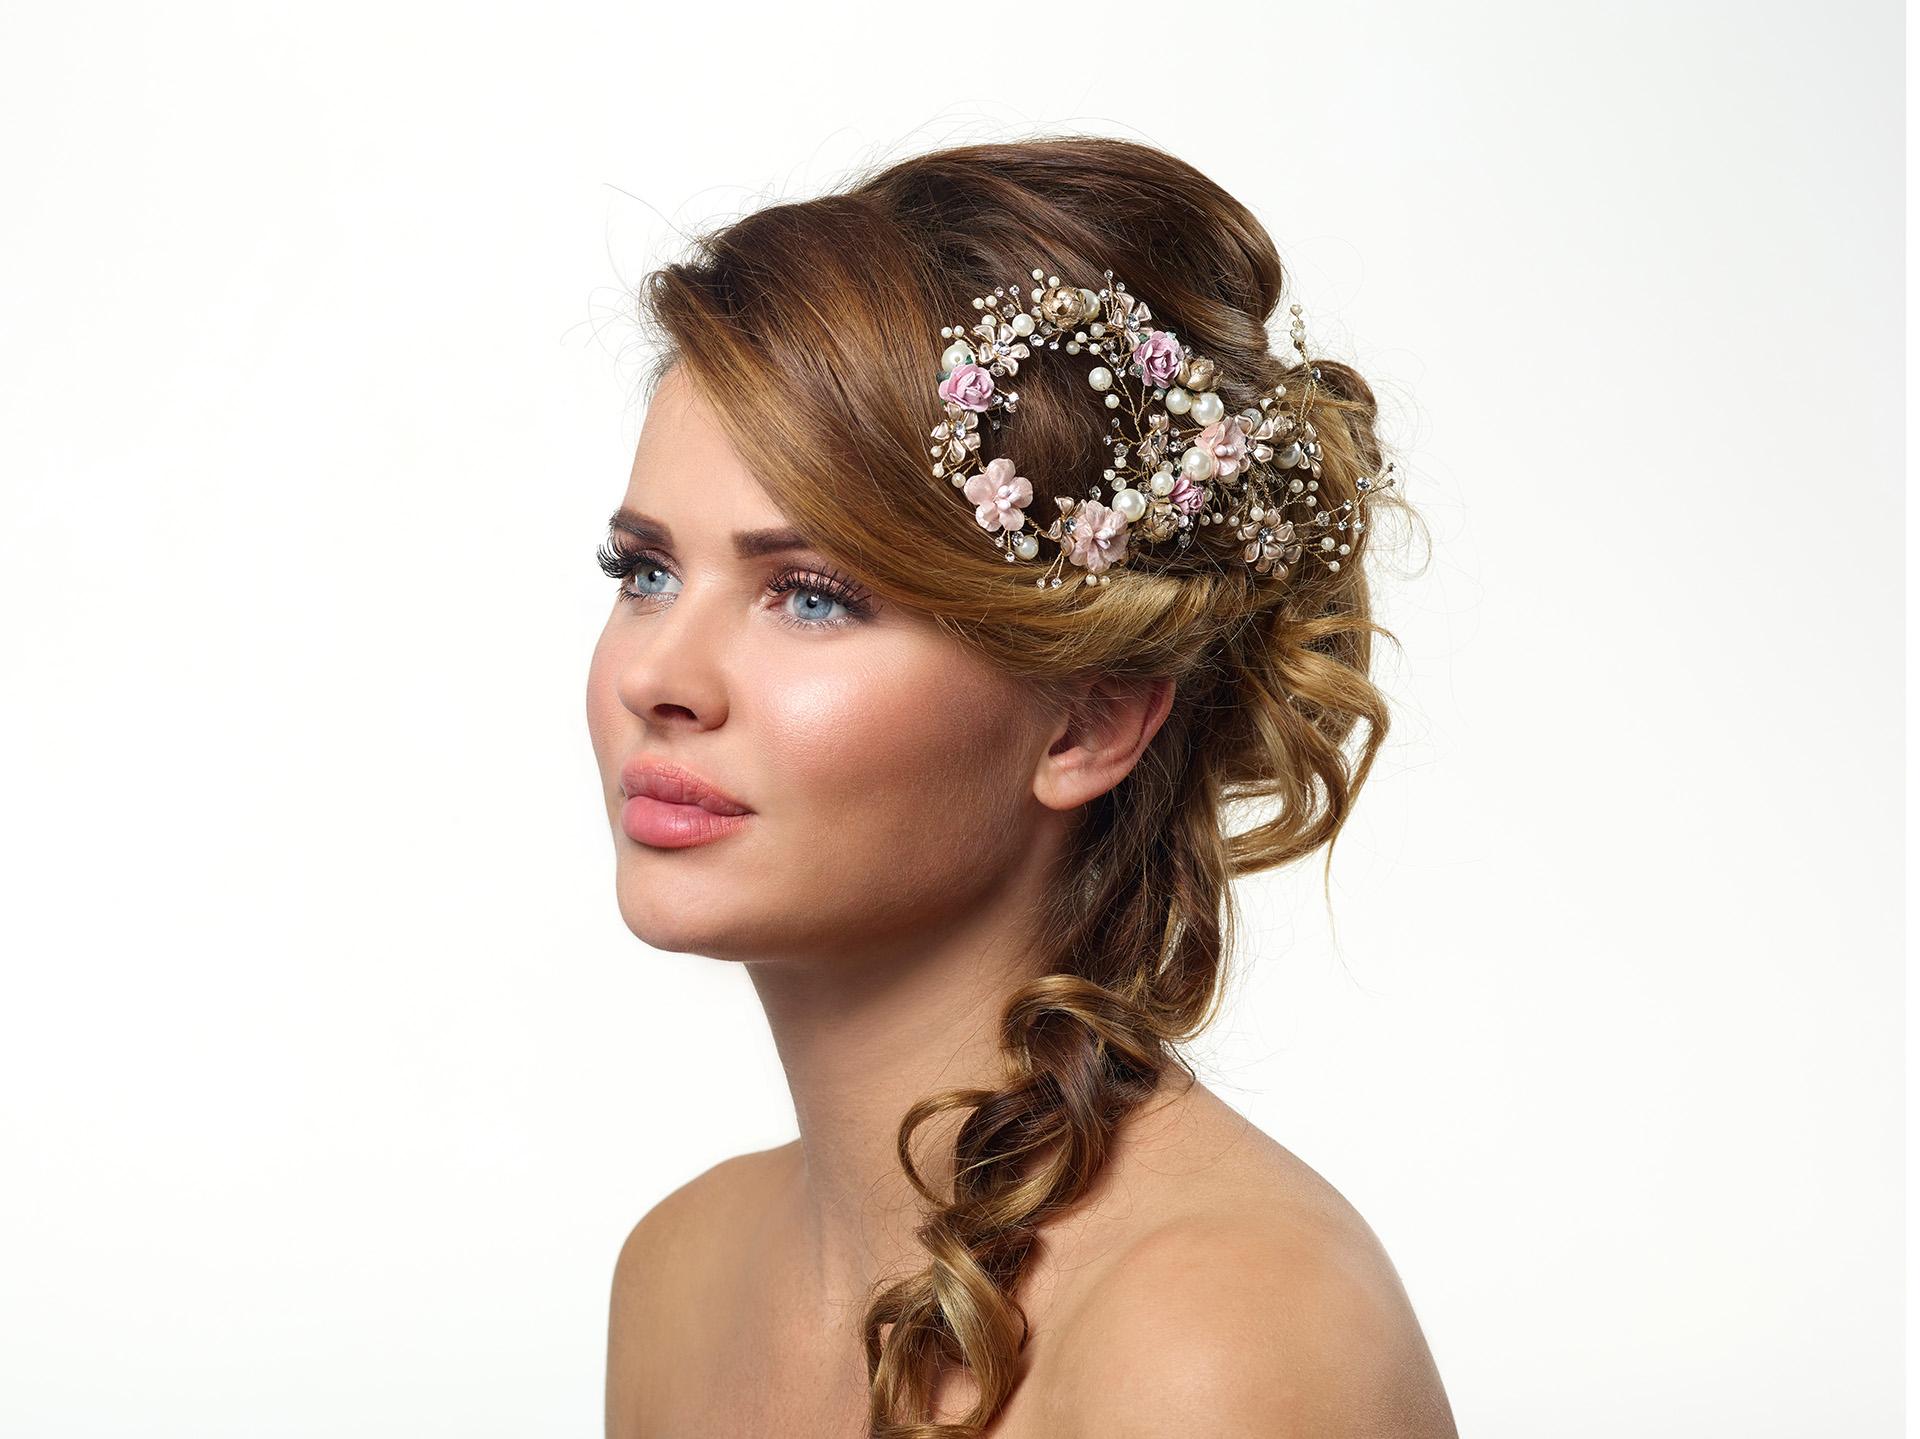 Hair Jewellery by Poirier_image_1.jpg